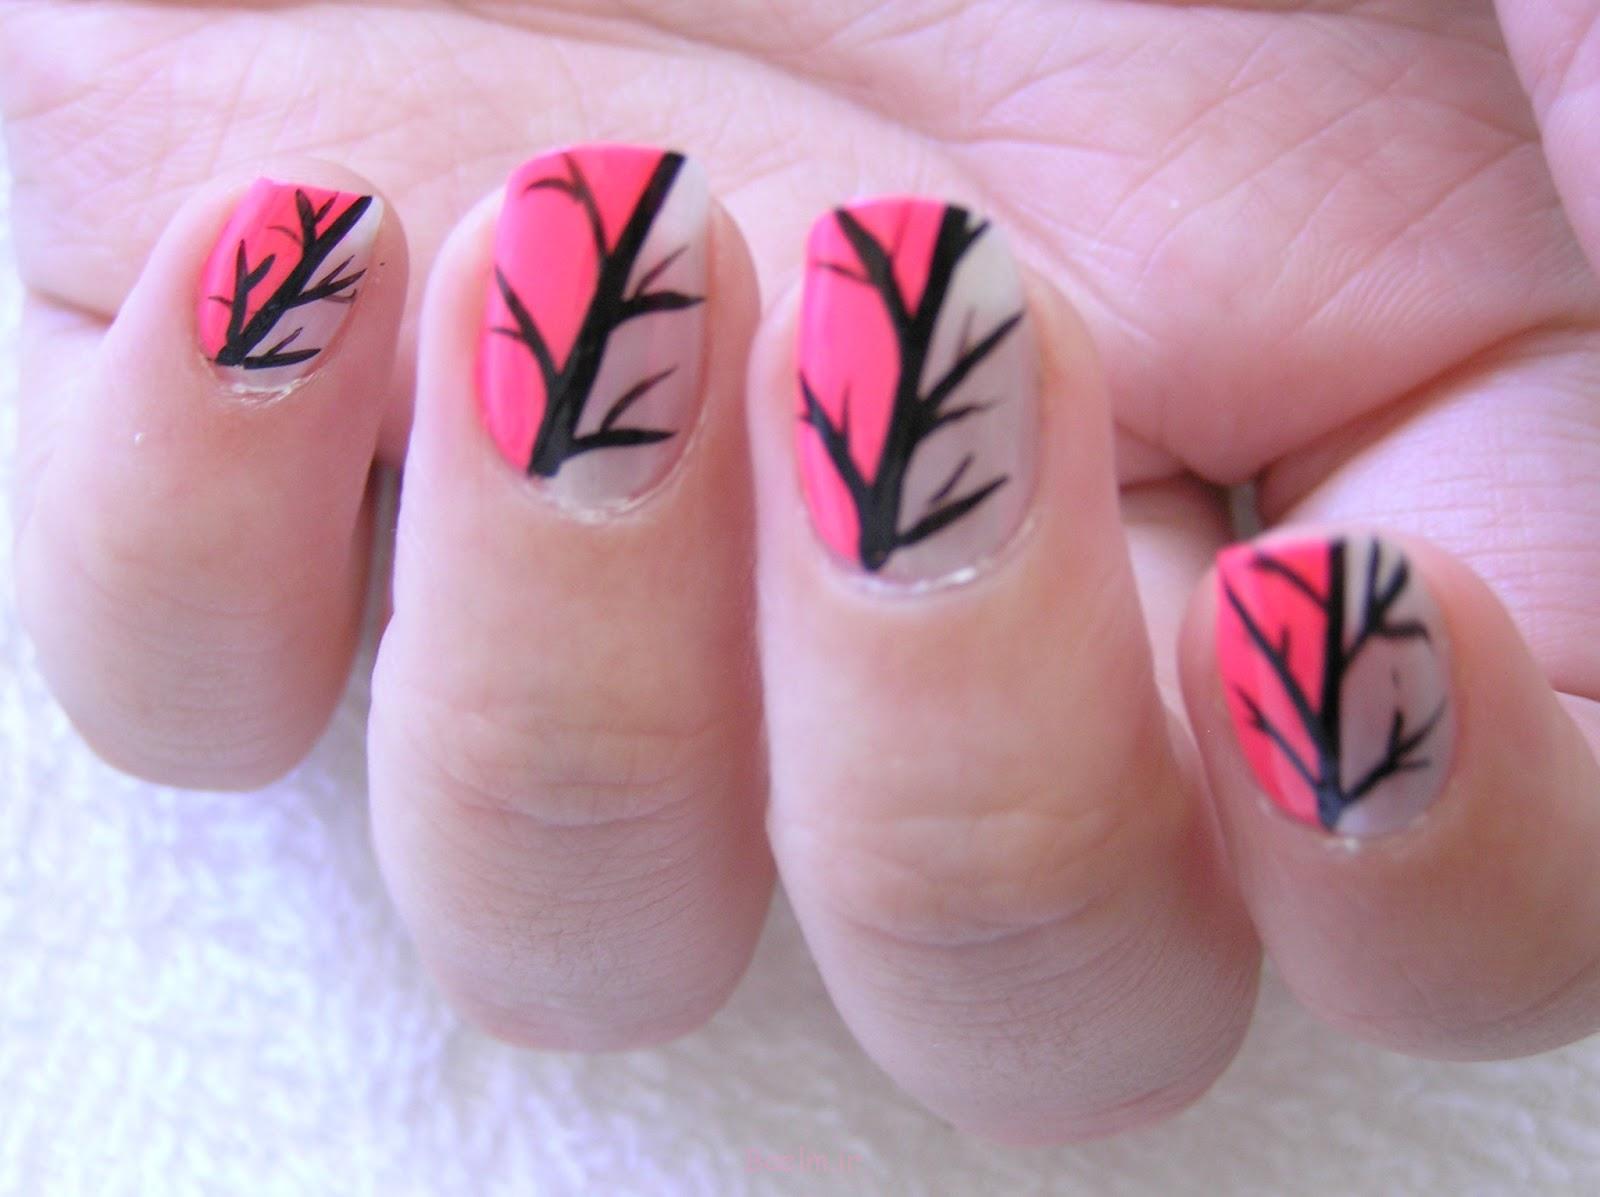 http://trendymods.com/wp-content/uploads/2015/06/cool-nail-art-design-ideas.jpg